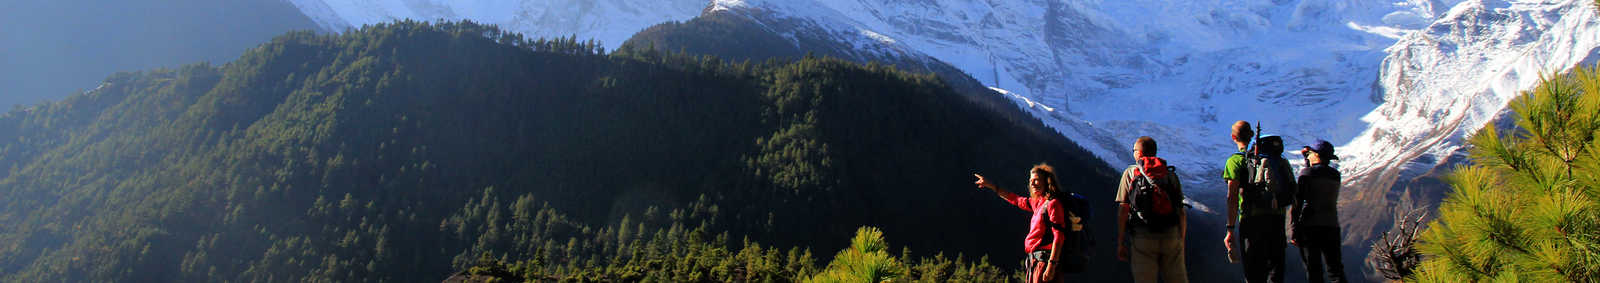 The way up towards Chulu, Himalaya, Nepal